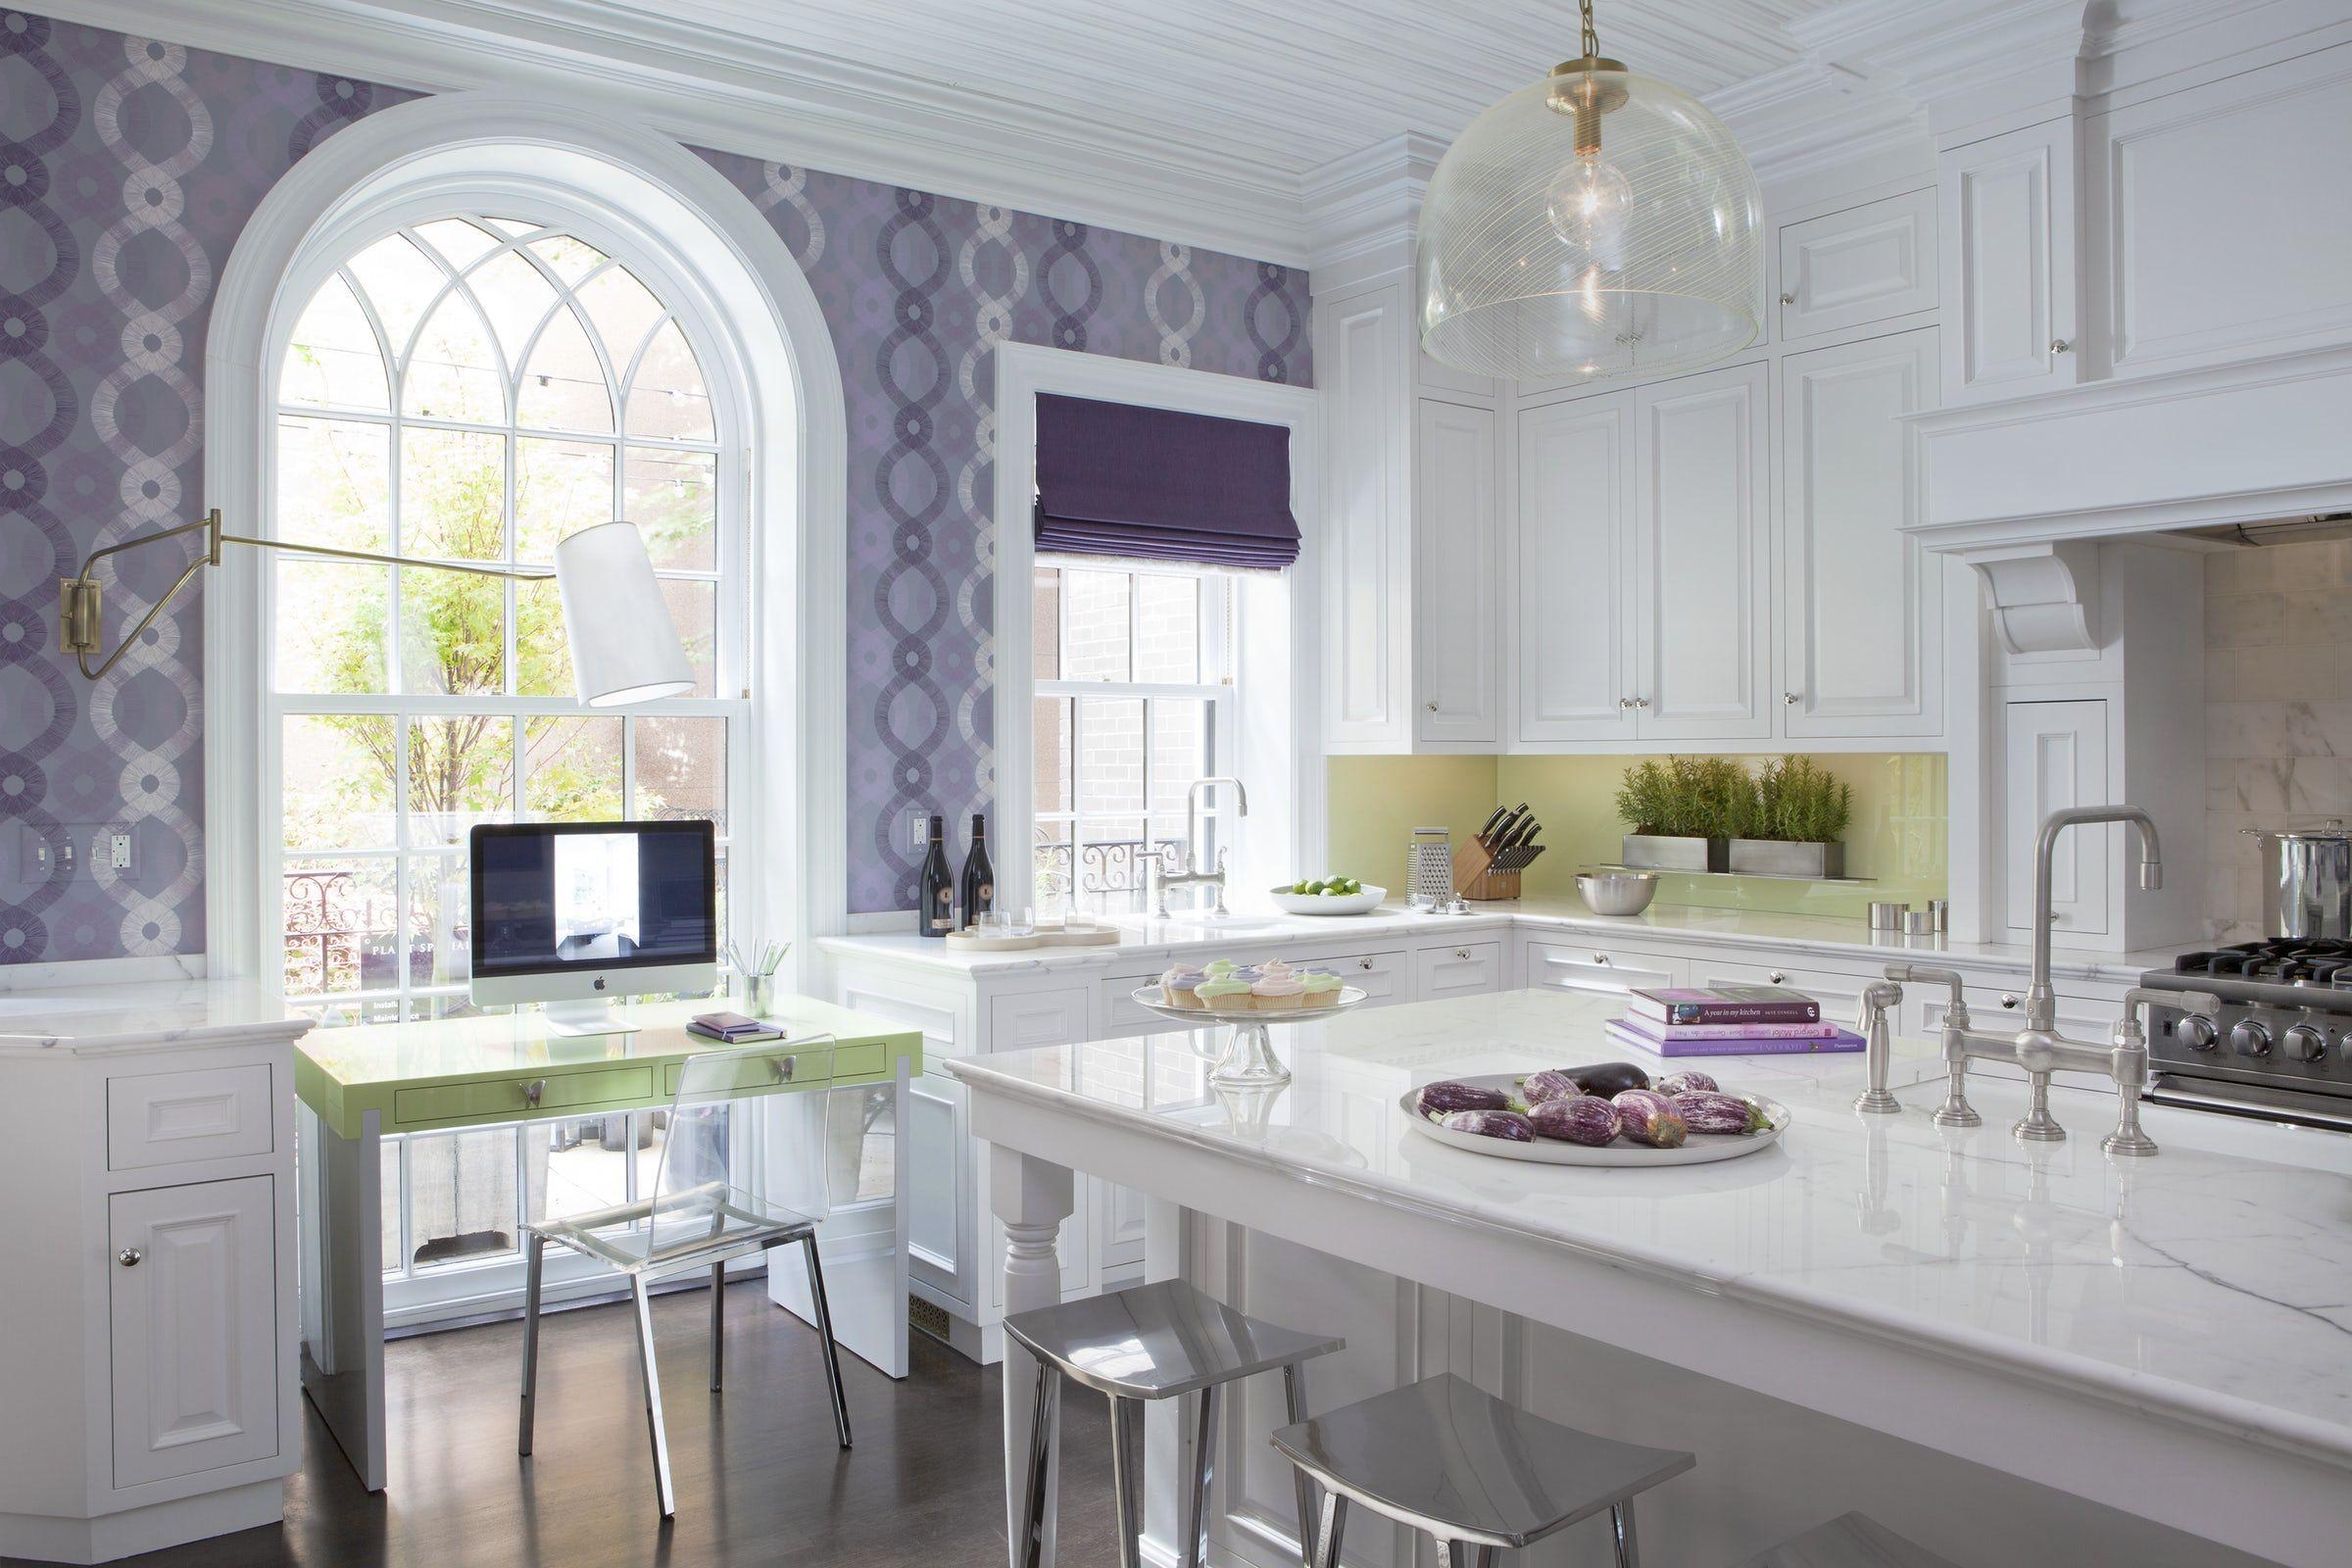 Kitchen Wallpaper Ideas